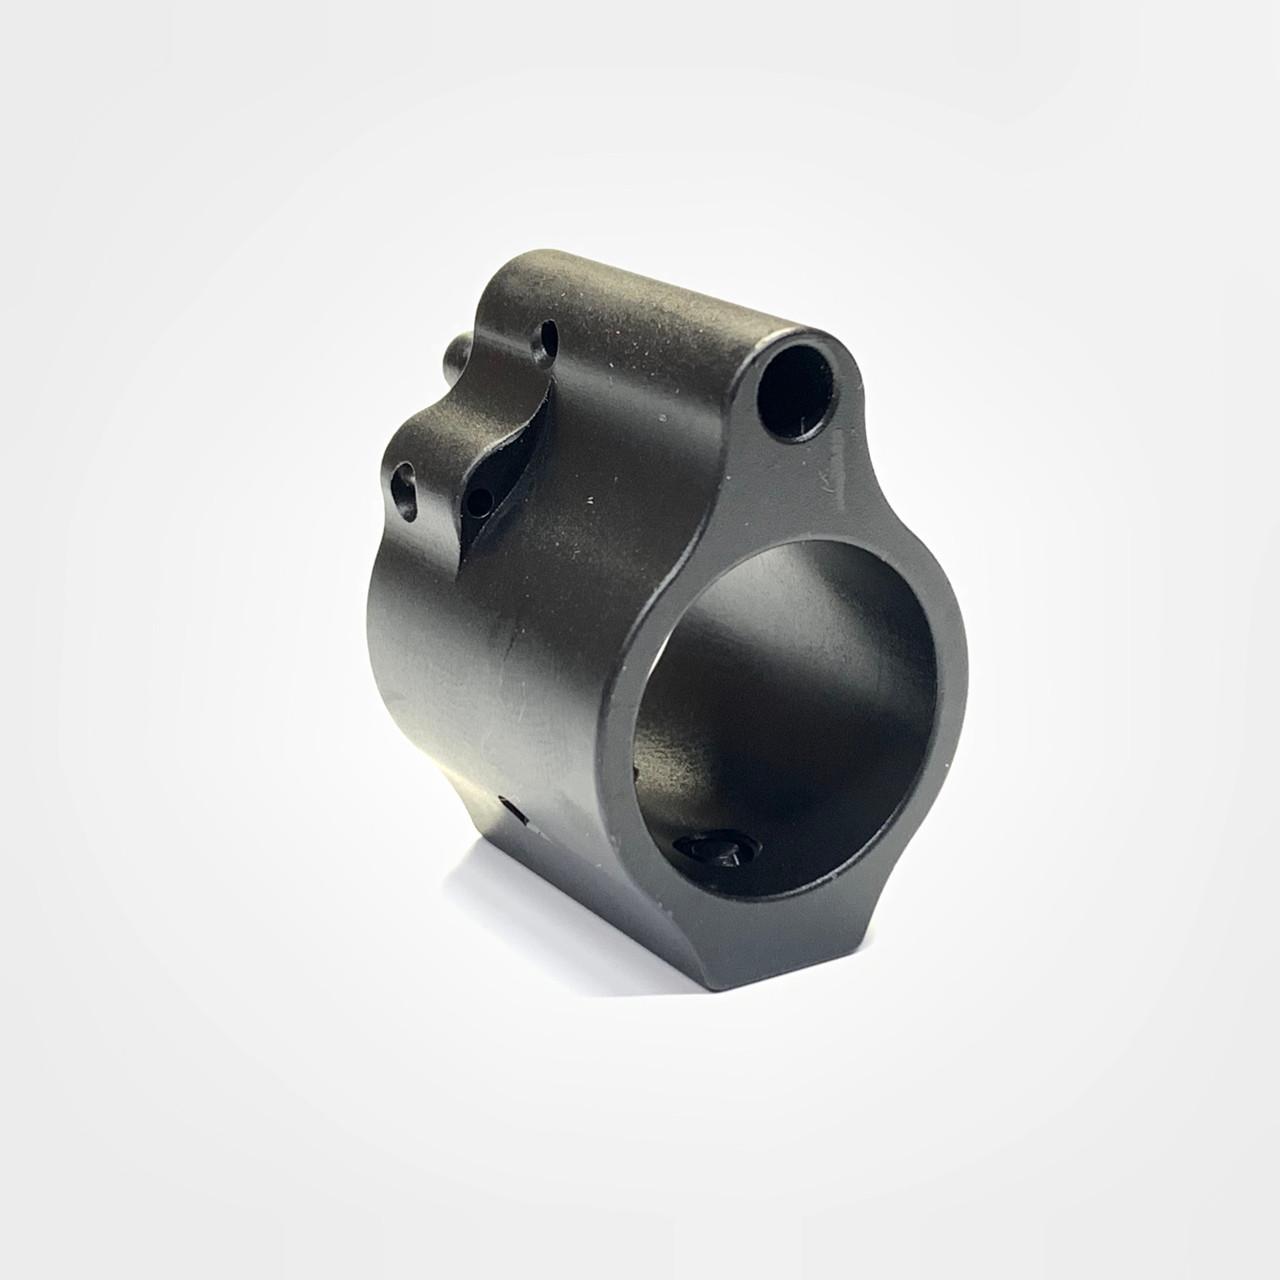 Adjustable Low Profile Gas Block .875 ***New***